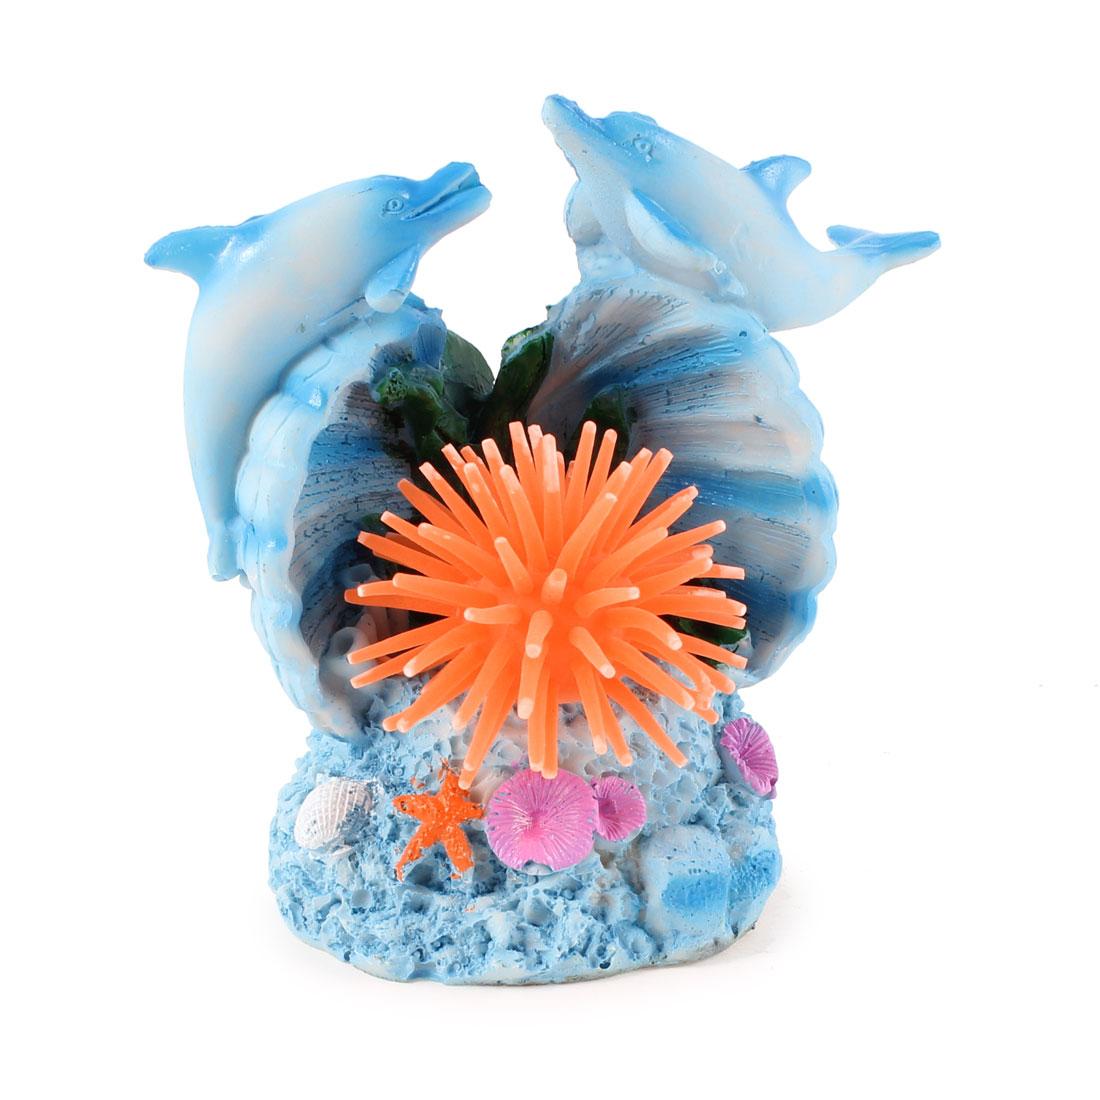 2 Pcs Blue Swing Tail Dolphin Orange Silicone Sea Anemone Decor for Aquarium